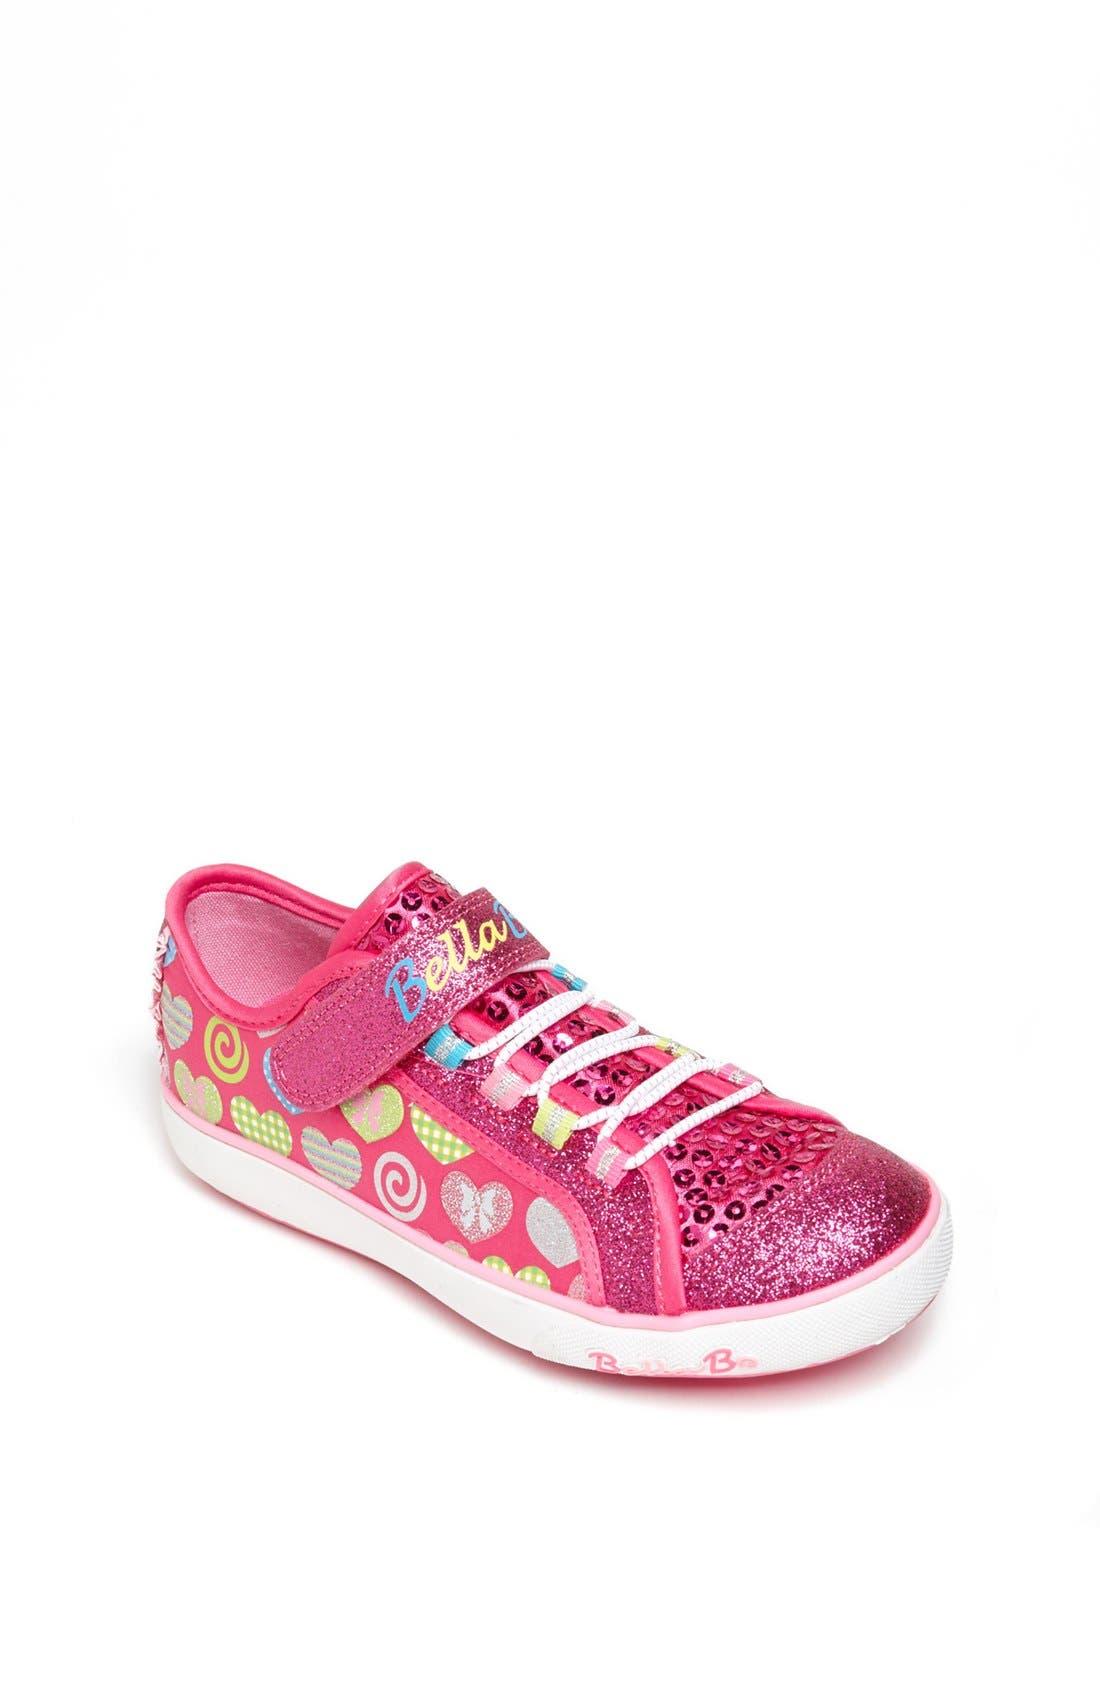 Main Image - SKECHERS 'Bella Ballerina - Curtsies' Sneaker (Toddler, Little Kid & Big Kid)